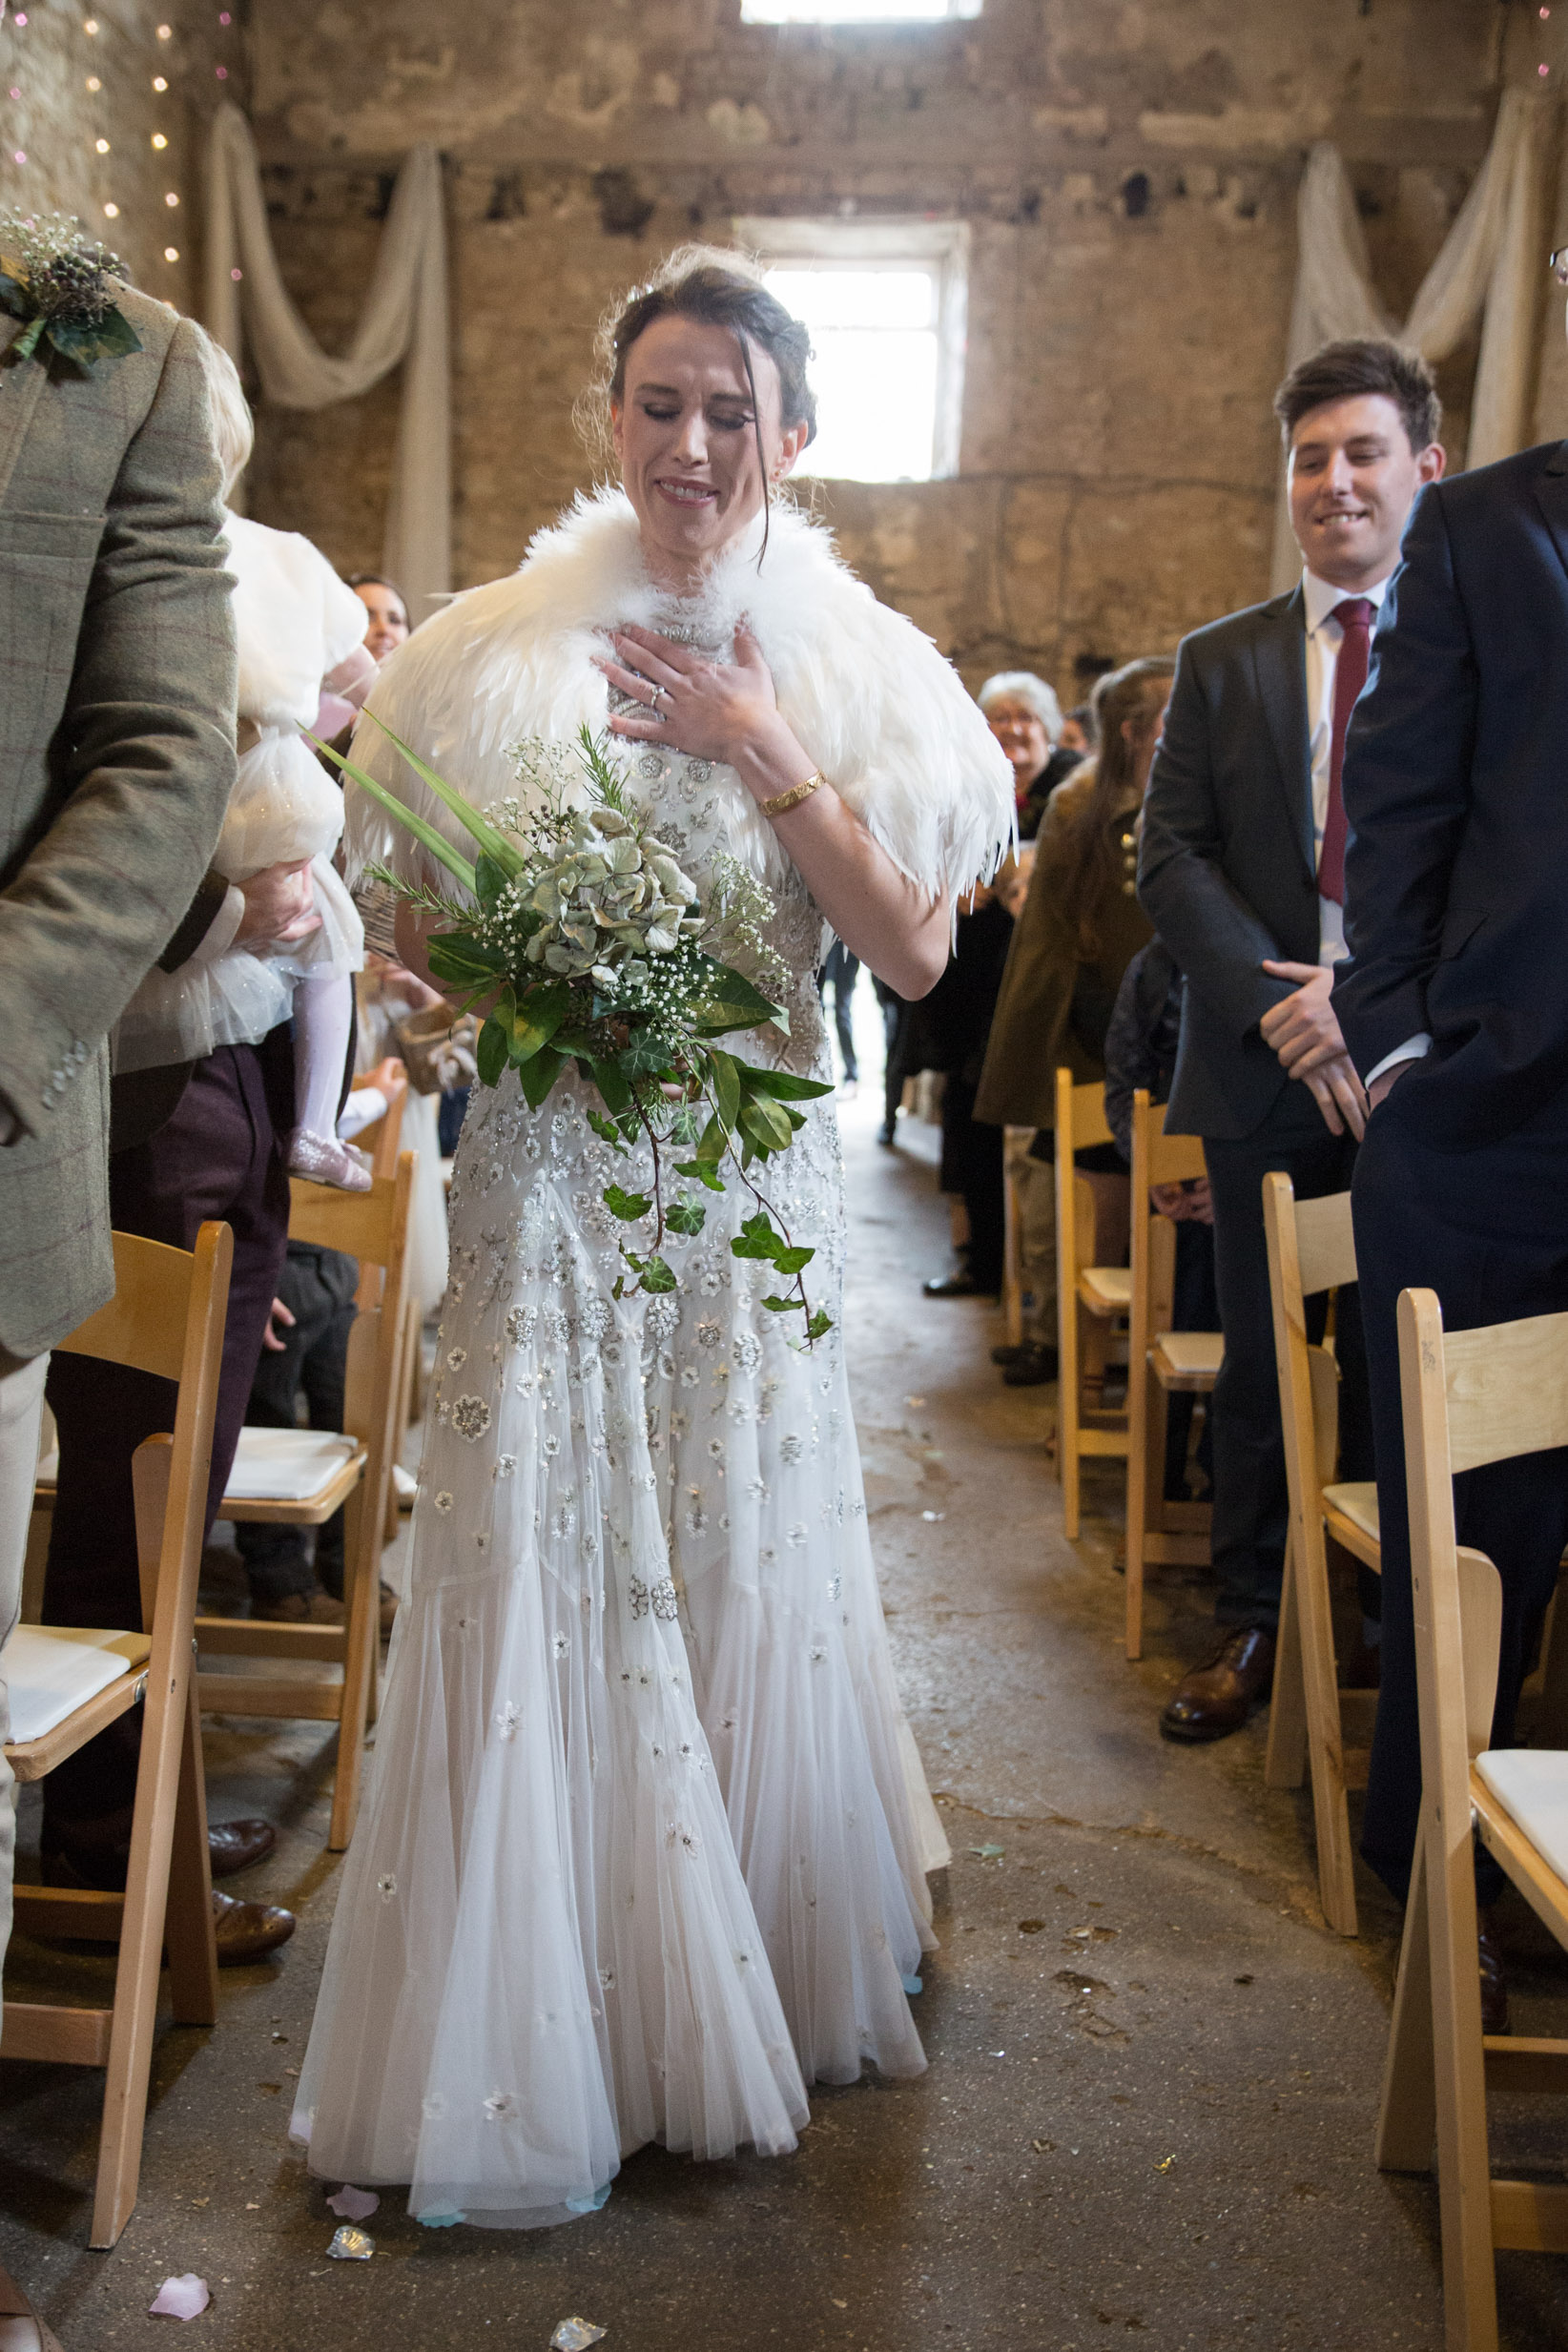 Jess & Ben - Bristol Wedding Photographer - Wright Wedding Photography - 62